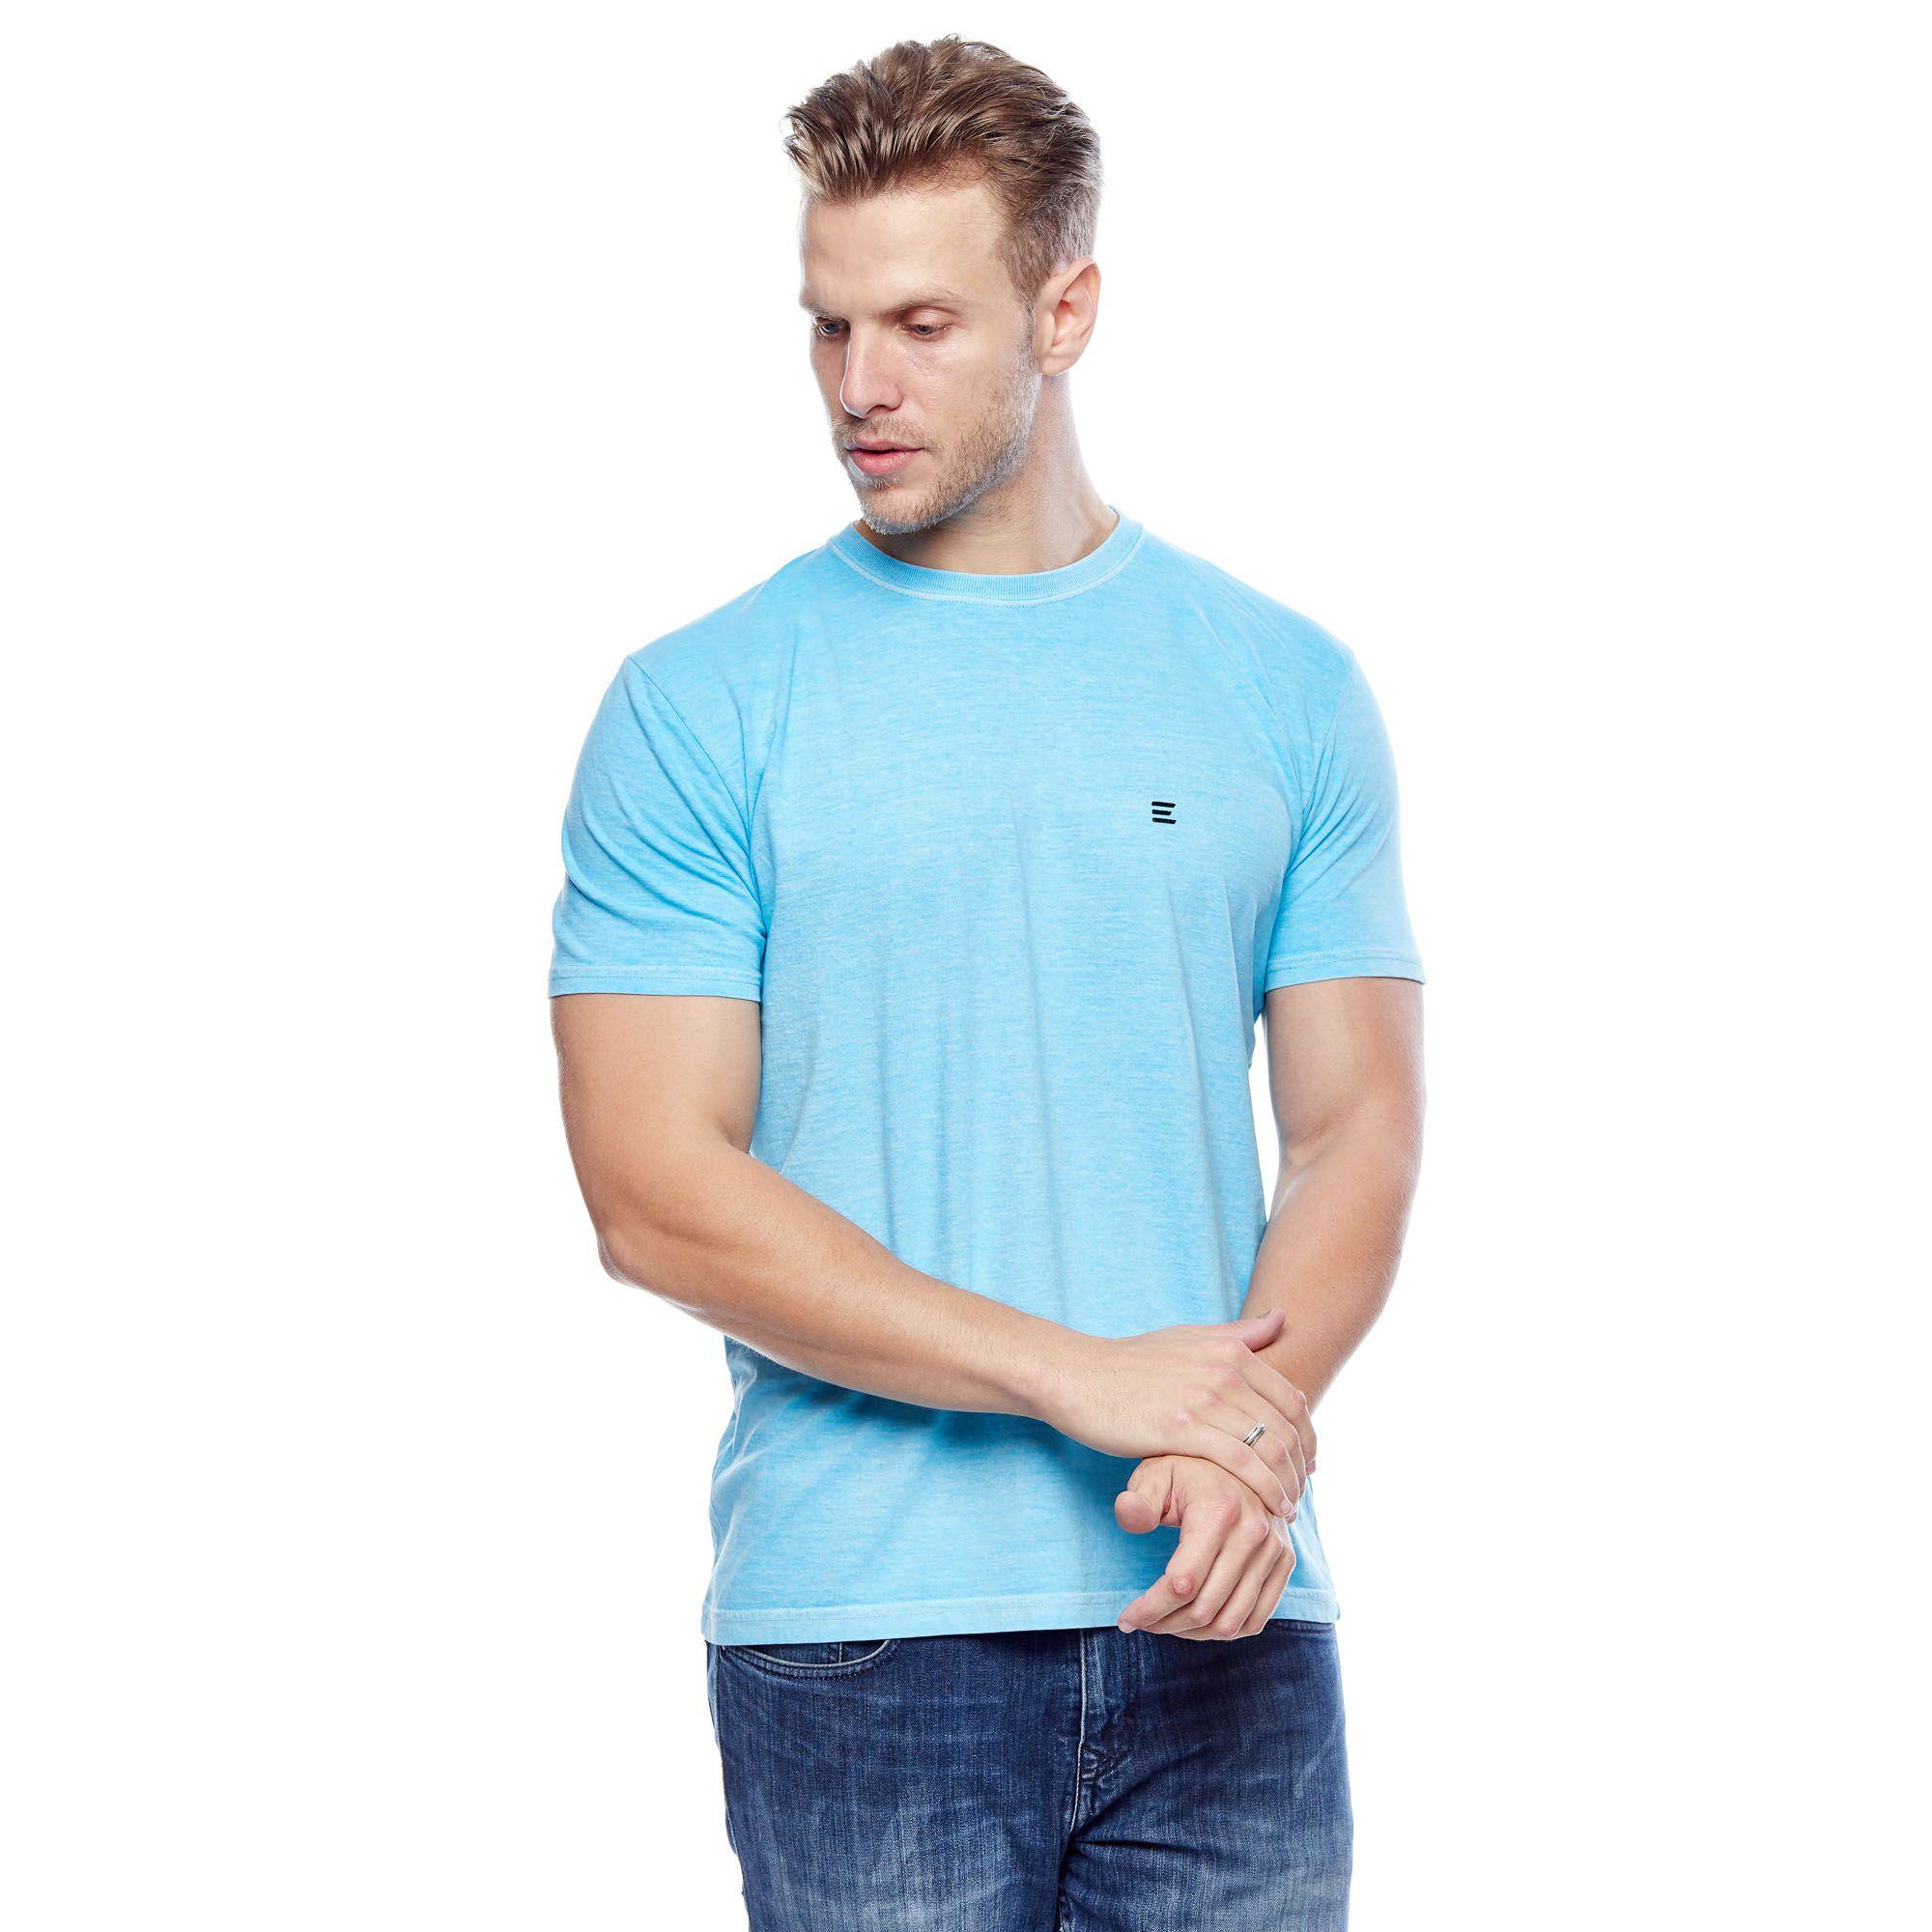 Camiseta Básica Estonada Neon Masculina Evolvee